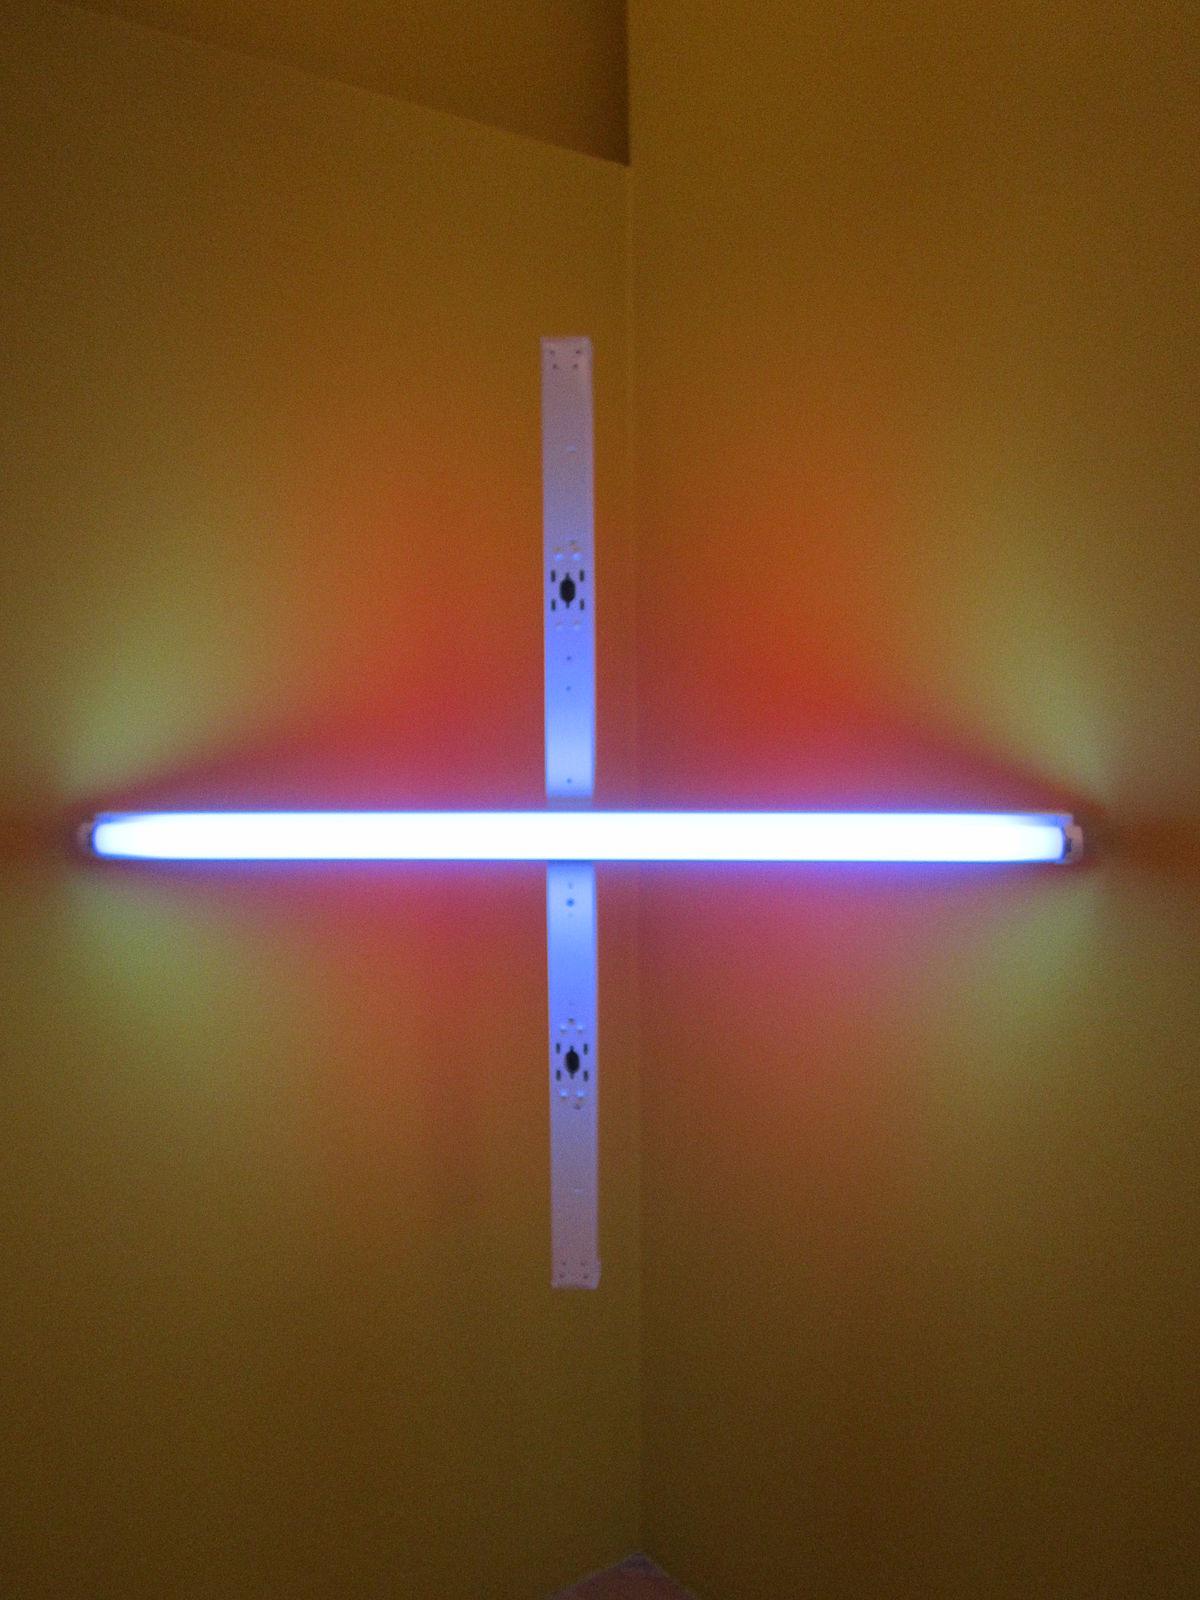 Dan flavin wikip dia for Oeuvre minimaliste